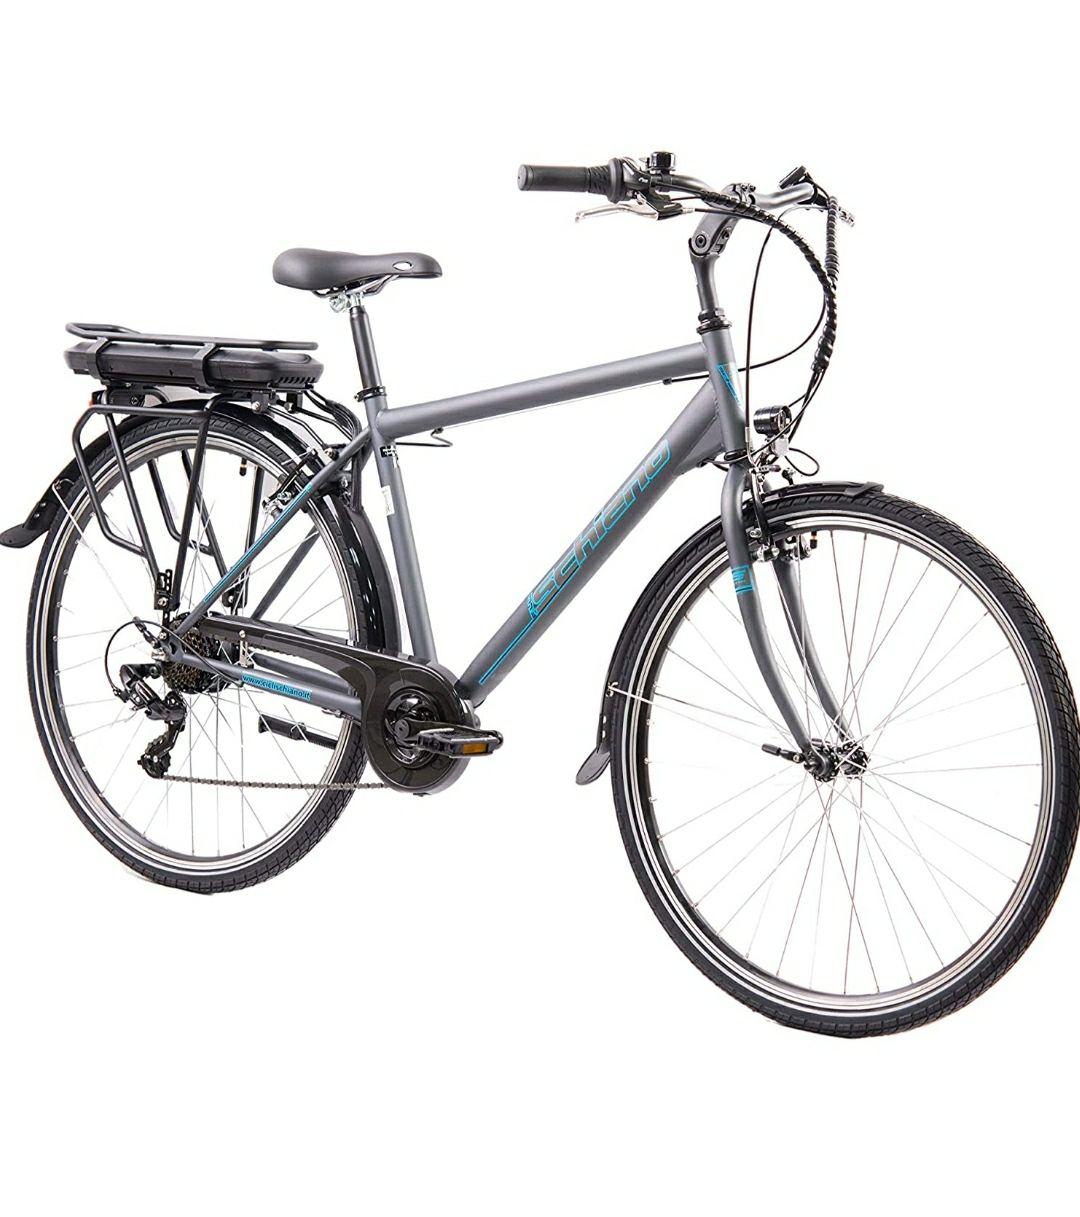 Bicicleta eléctrica marca F. lli Schiano.